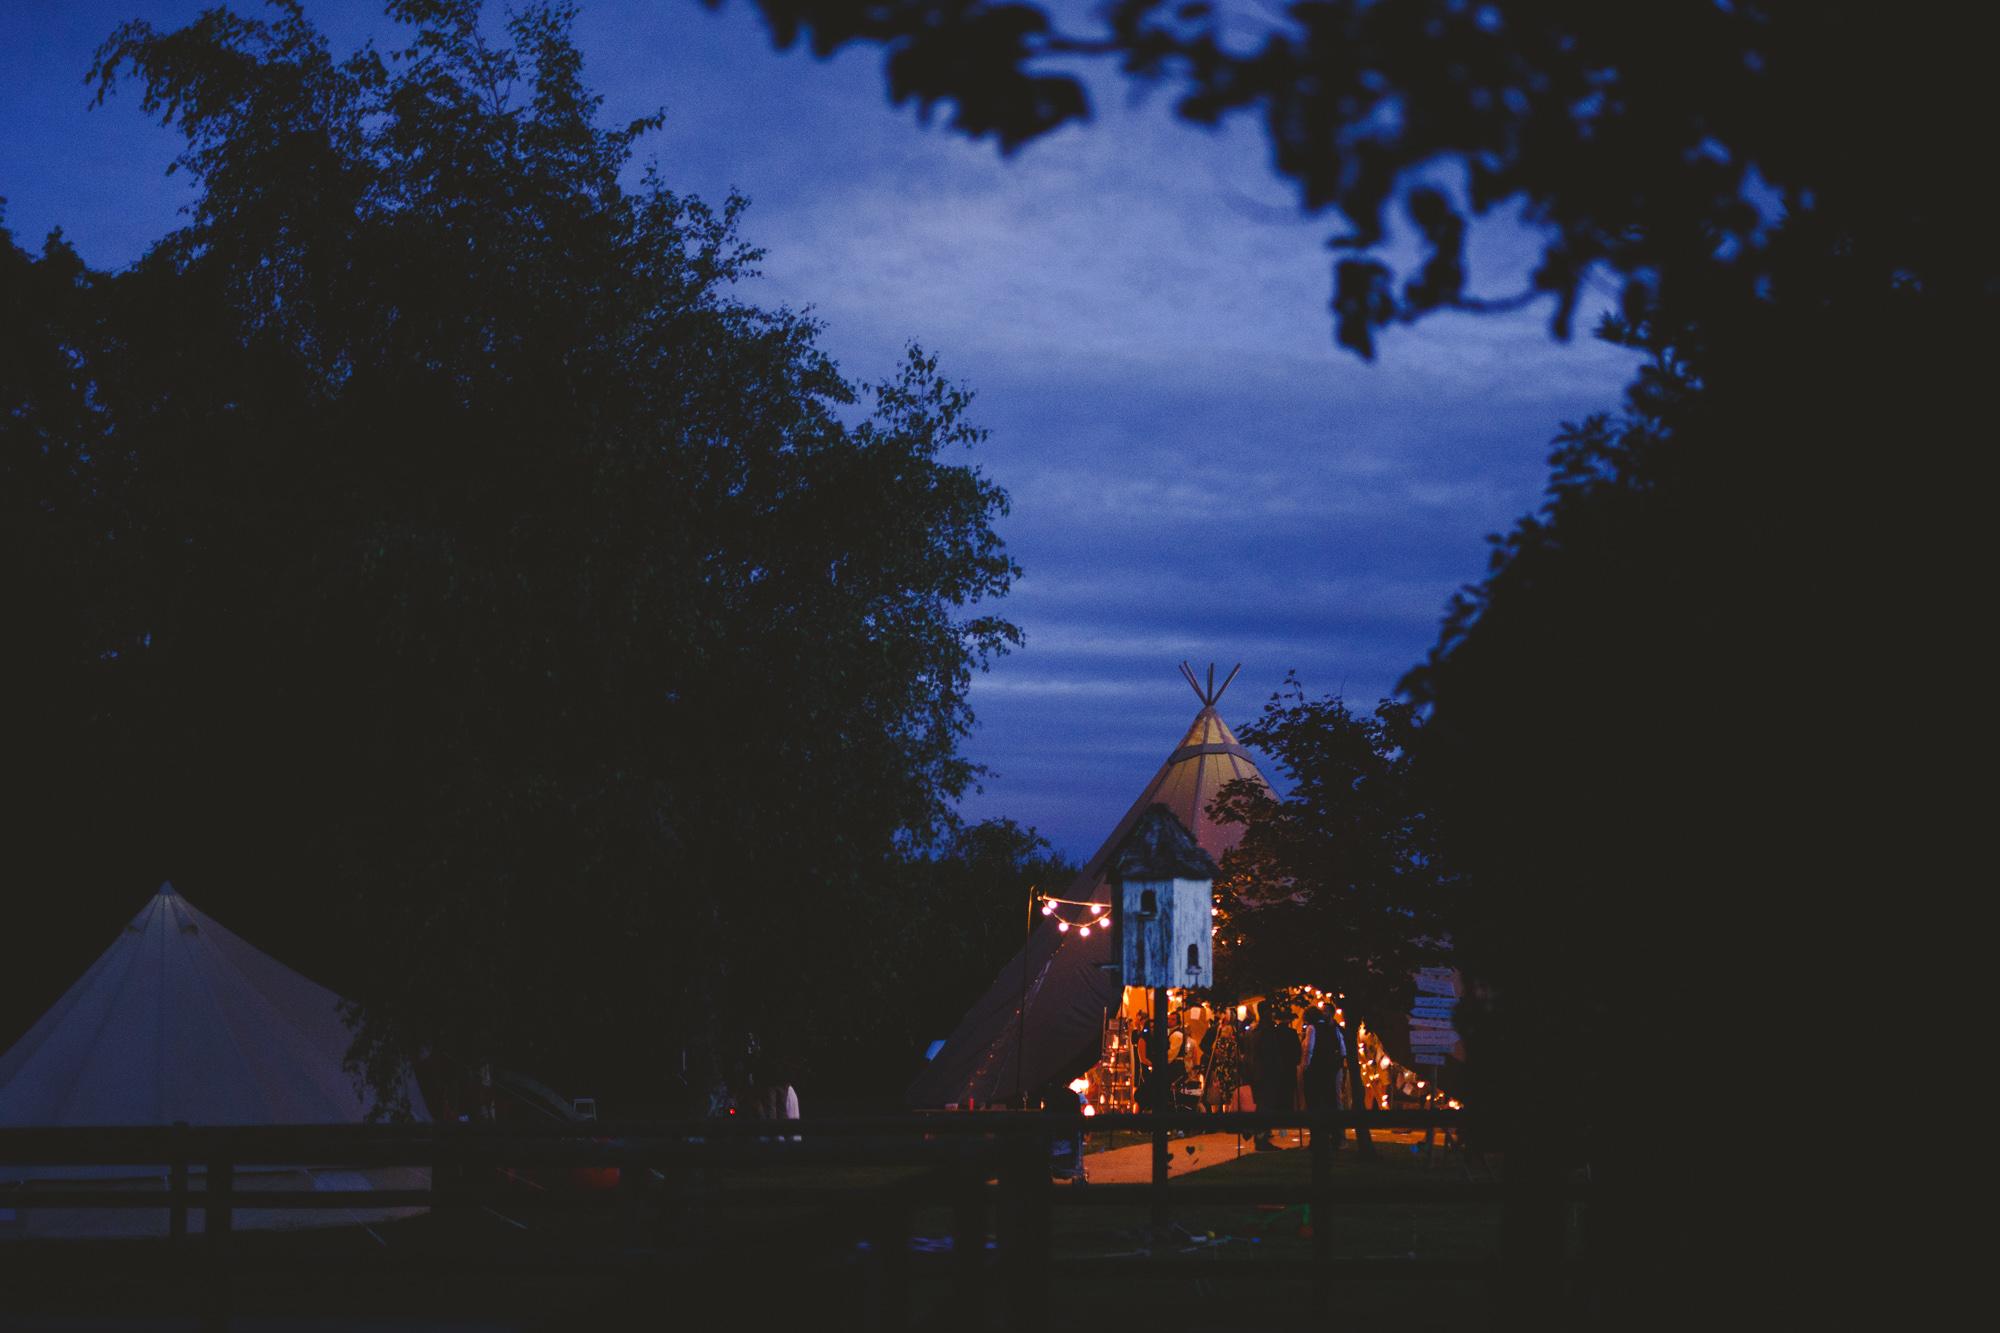 derbyshire-wedding-photographer-filmmaker-carsington-water--24.jpg